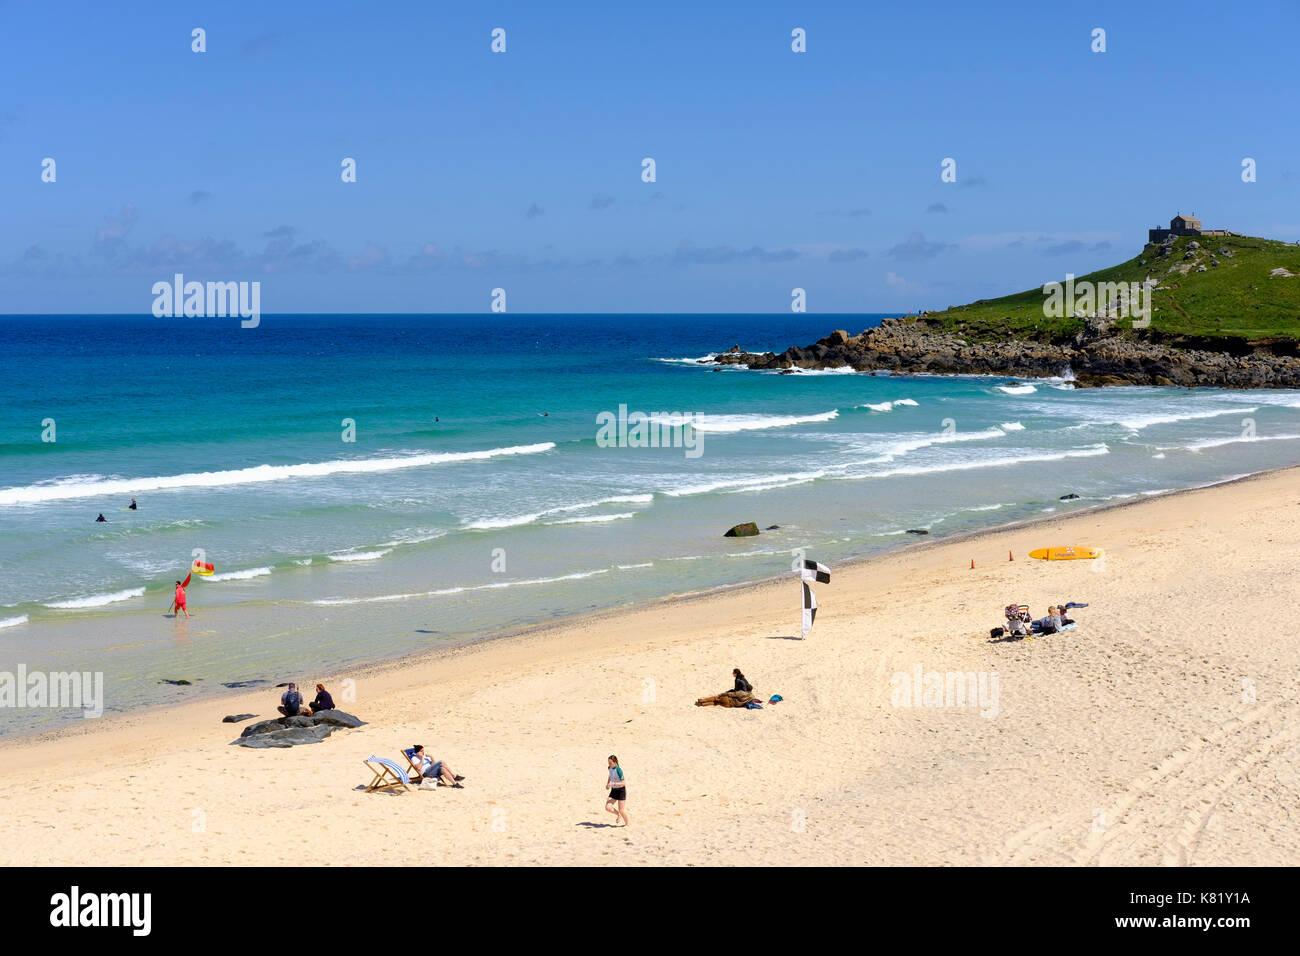 Porthmeor Beach, St Ives, Cornwall, England, Great Britain Stock Photo